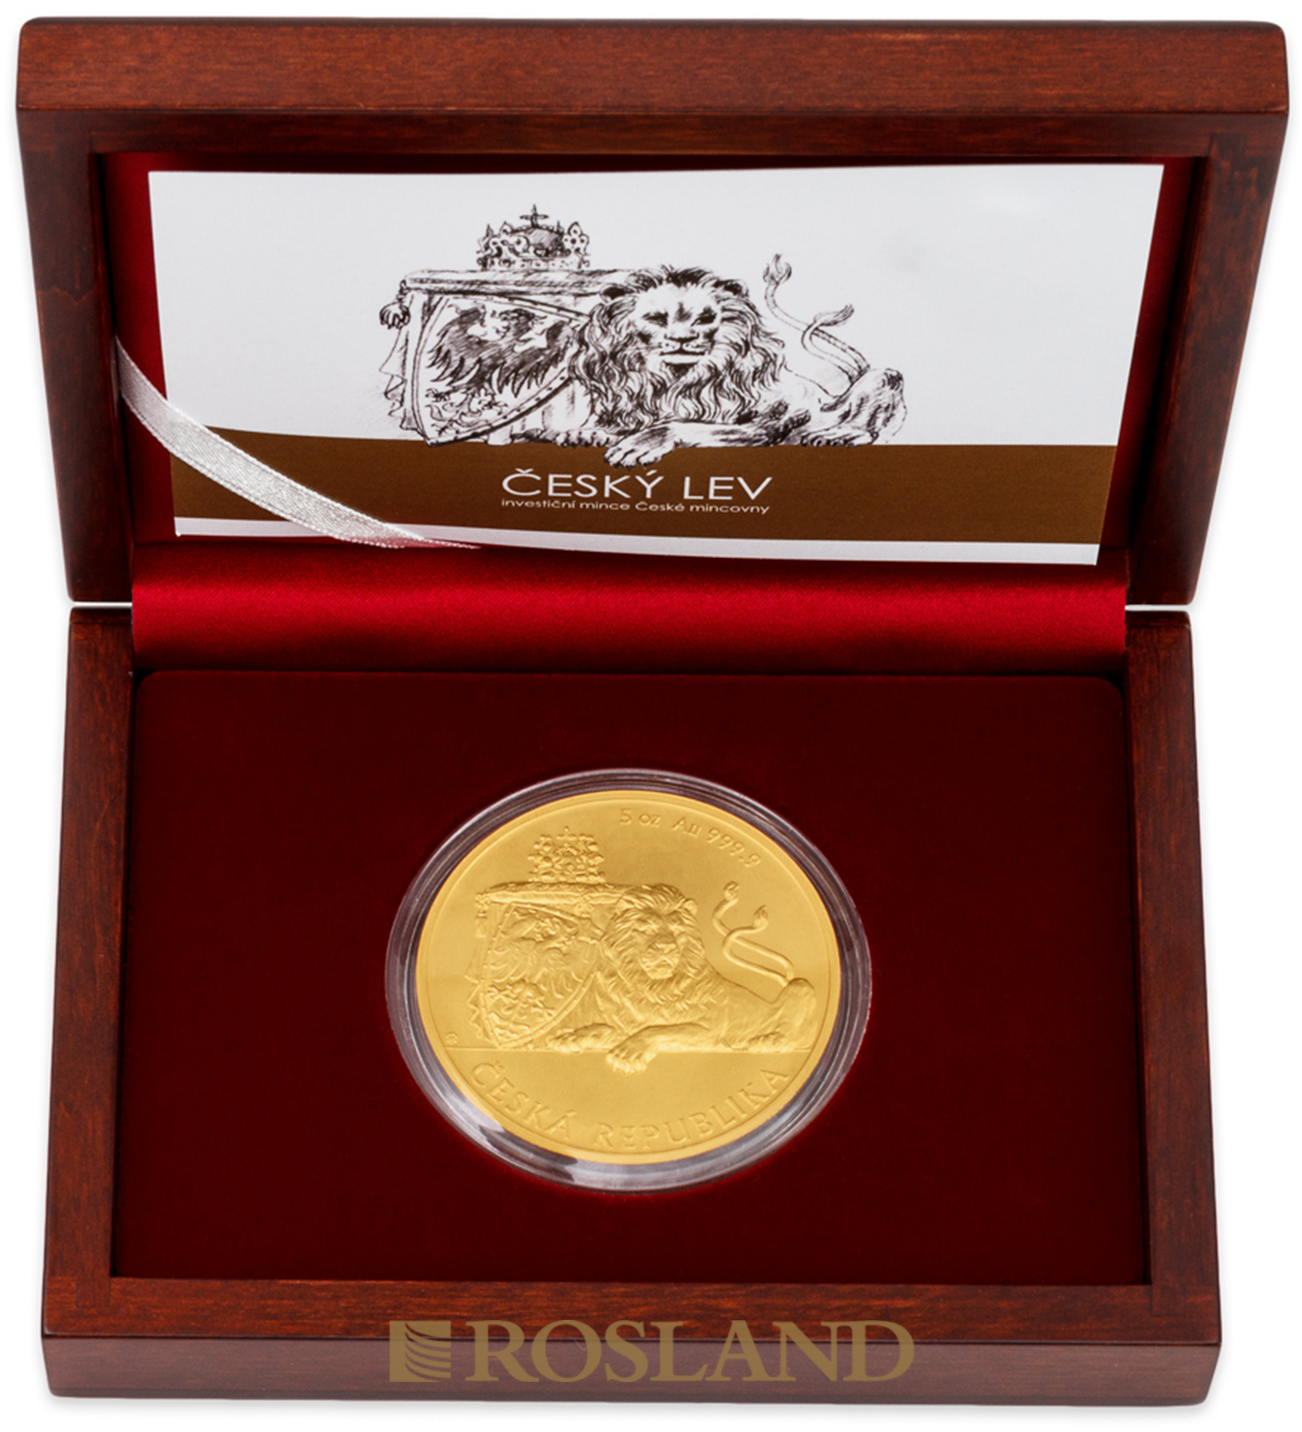 5 Unzen Goldmünze Tschechischer Löwe 2018 (Box, Zertifikat)